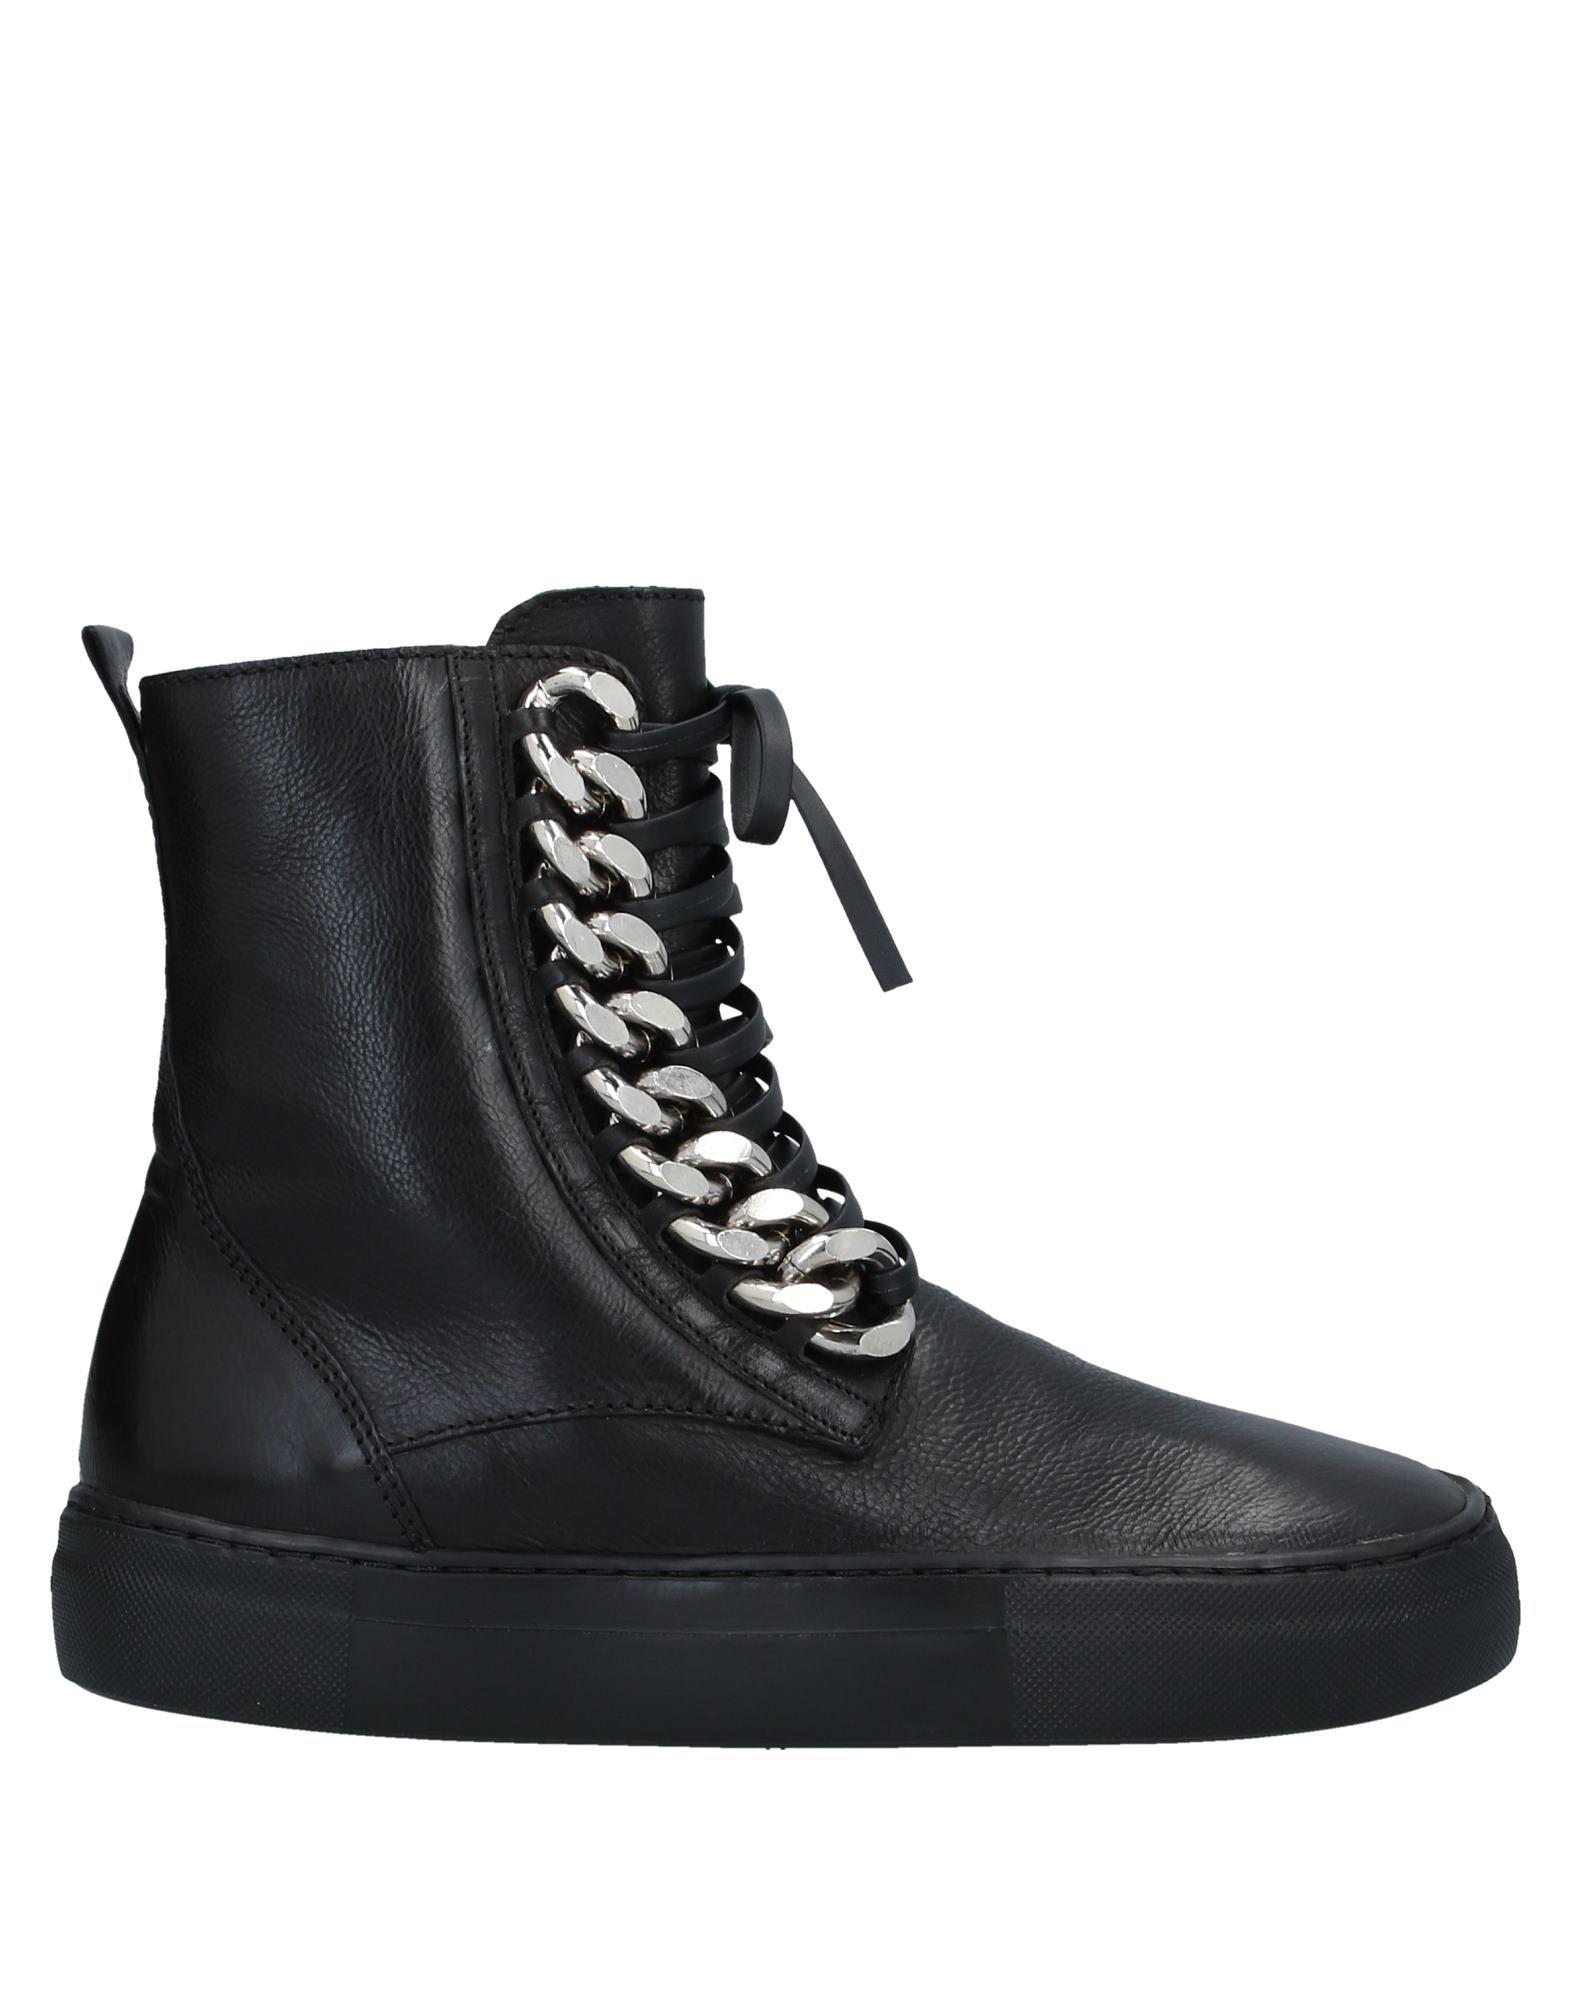 GUGLIELMO ROTTA Полусапоги и высокие ботинки ботинки guglielmo rotta ботинки с высоким берцем page 7